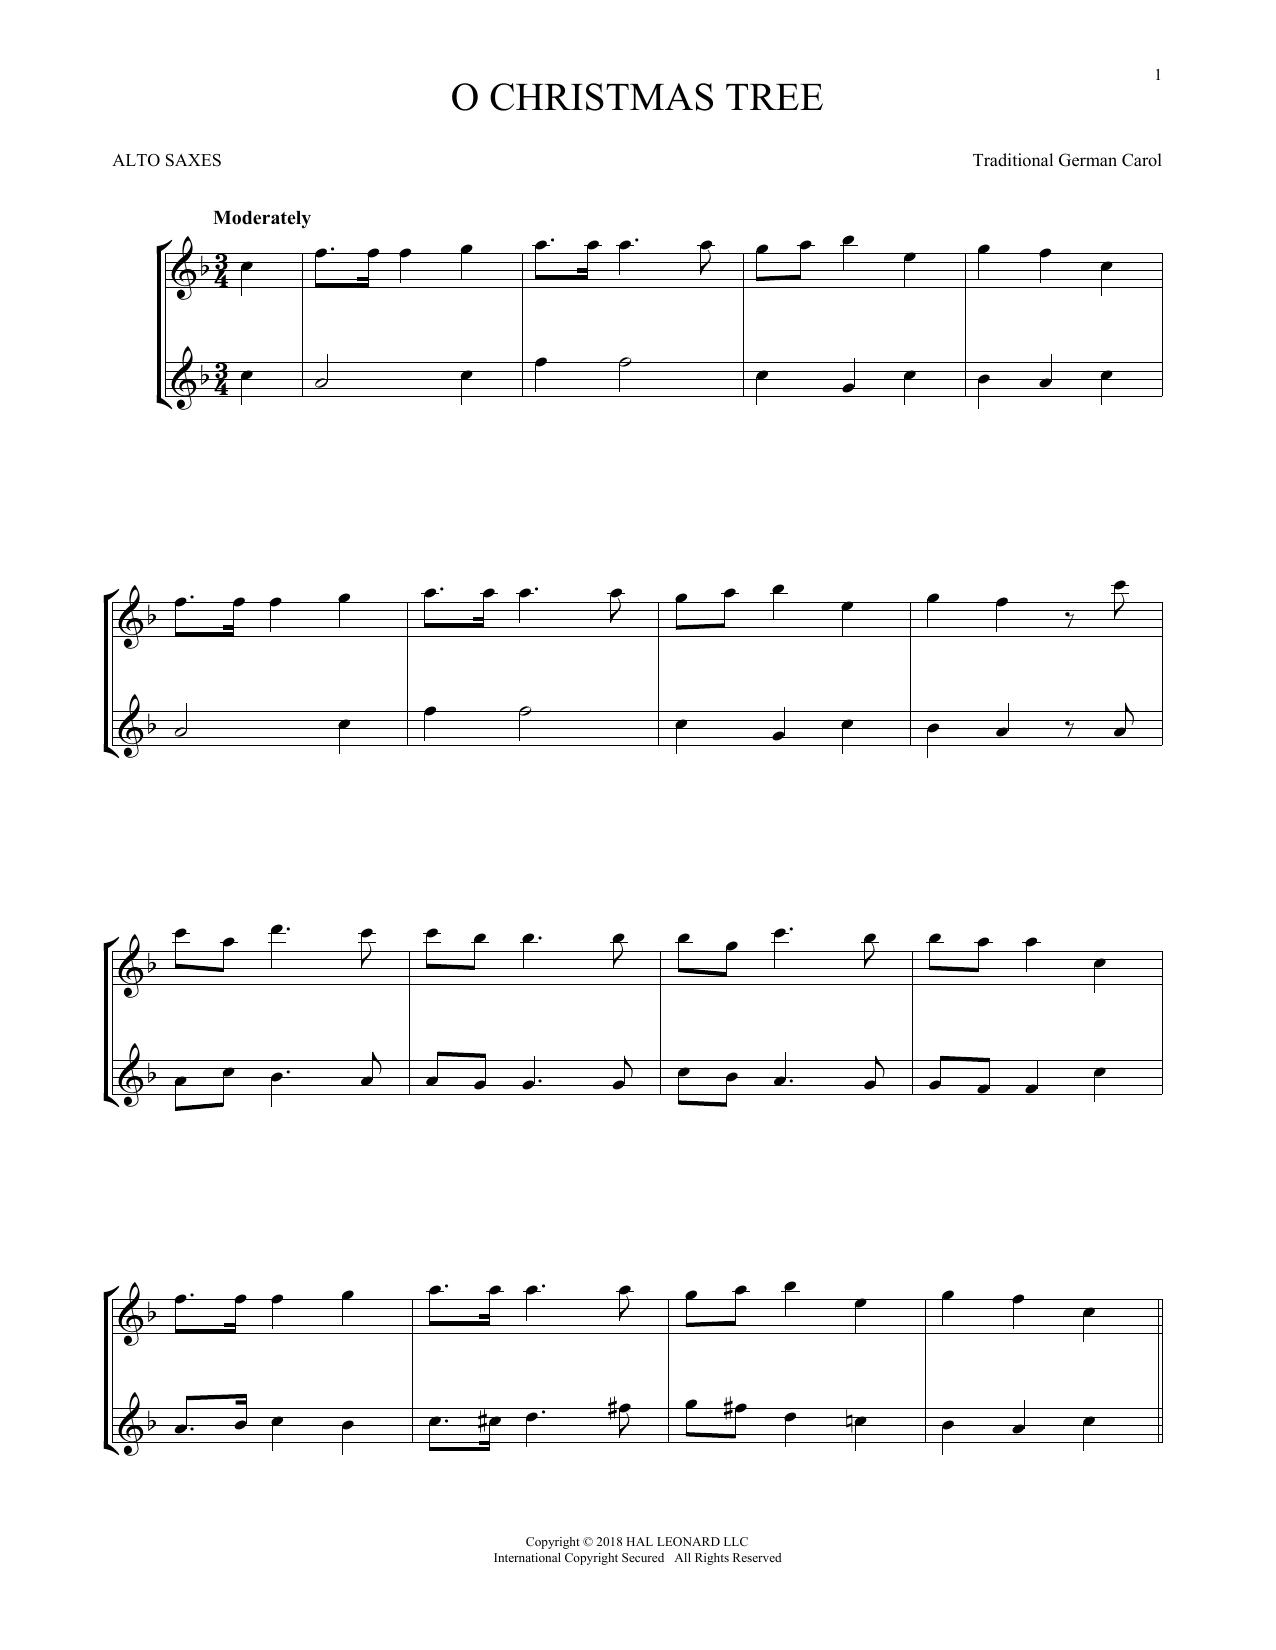 O Christmas Tree In German.Traditional German Carol O Christmas Tree Sheet Music Notes Chords Download Printable Alto Saxophone Duet Sku 255159